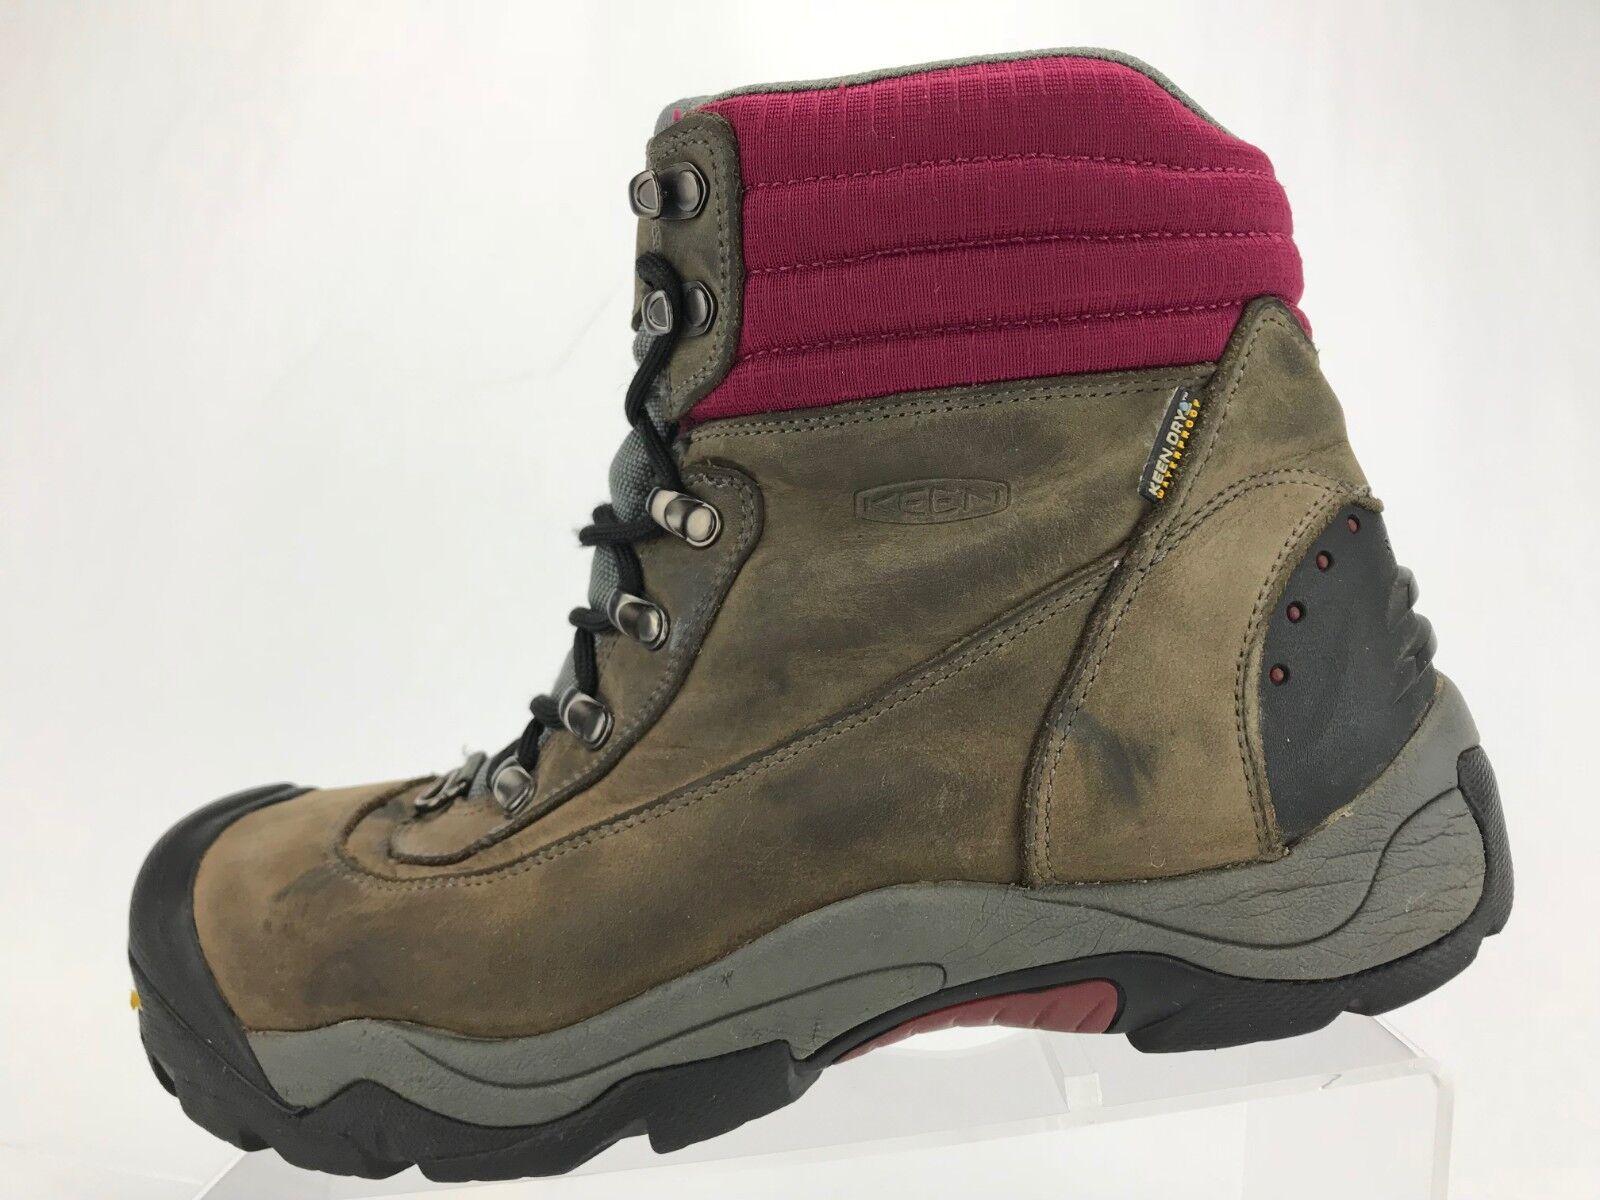 Keen Revel III Winter Boots Brown Insulated Insulated Insulated Trail Trekking Booties Womens Sz 10 d38859